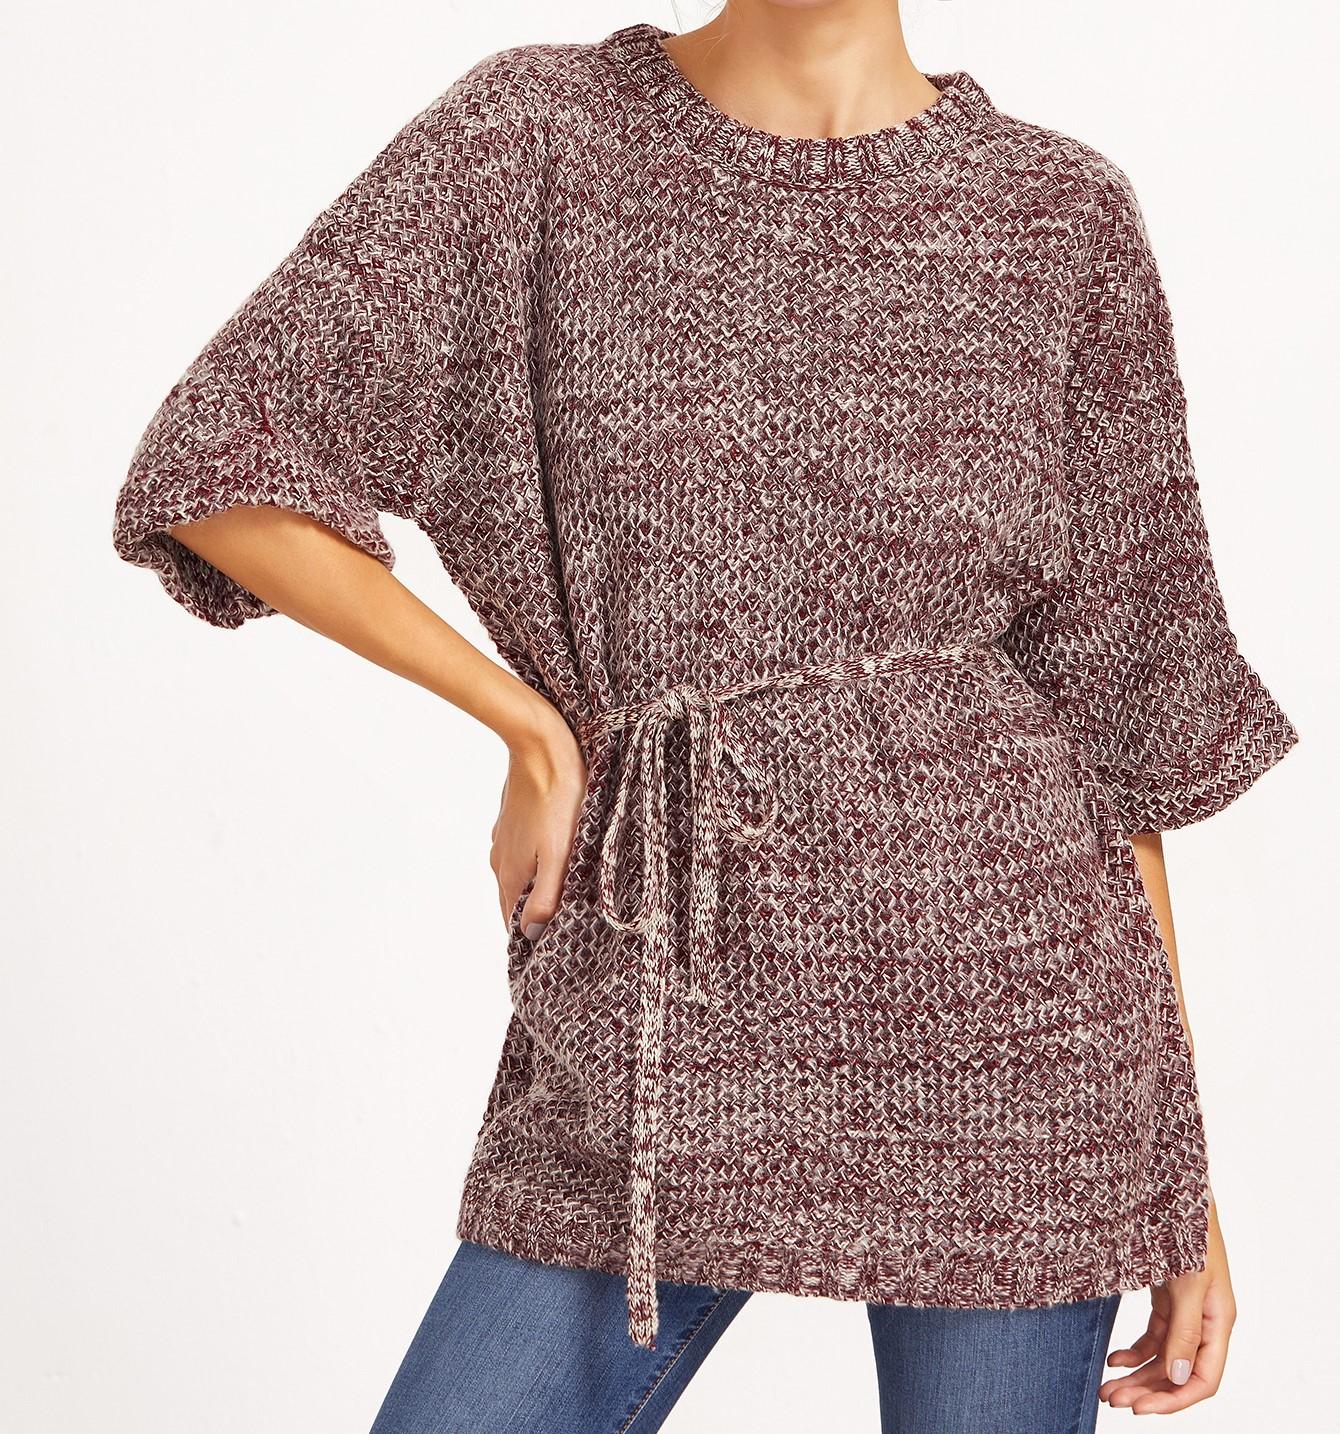 SheIn Burgundy Marled Knit Half Sleeve Sweater